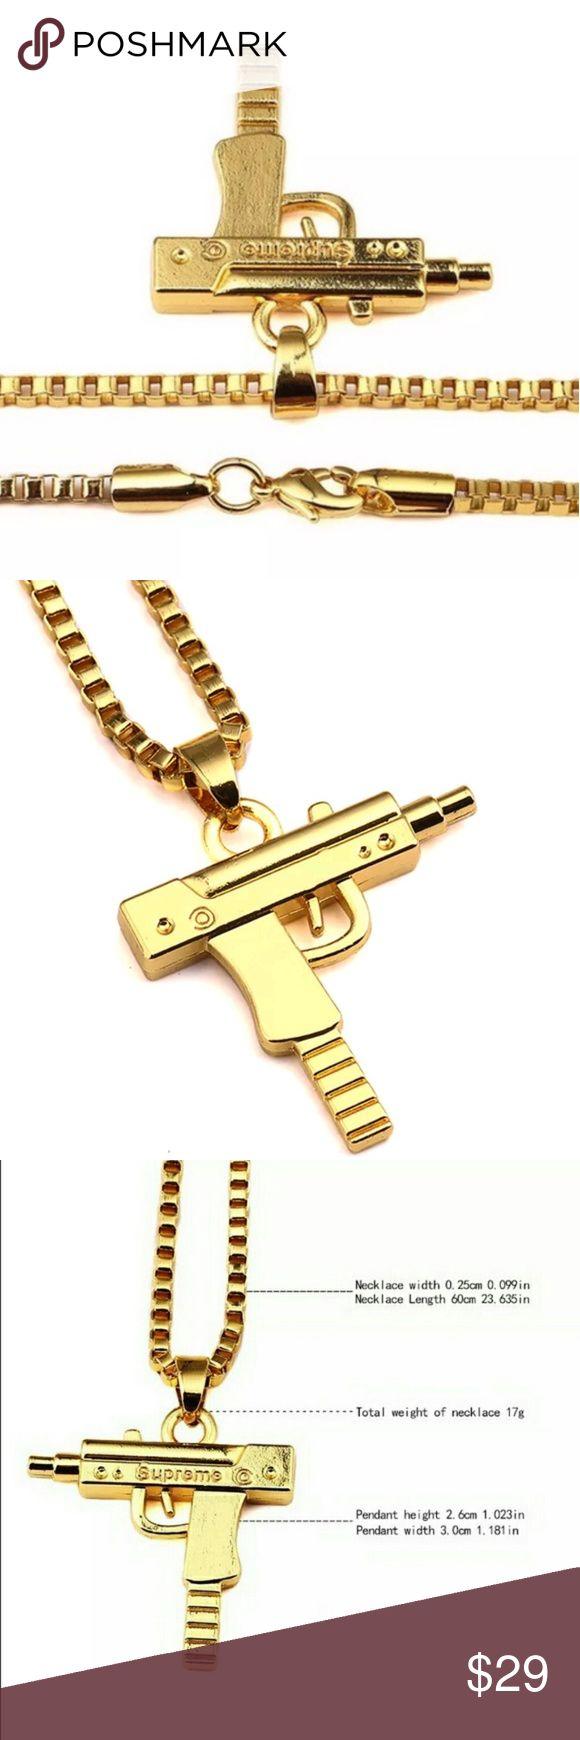 GOLD Supreme brand Uzi Necklace/Chain Gawld niggas GOLD Supreme Accessories Jewelry